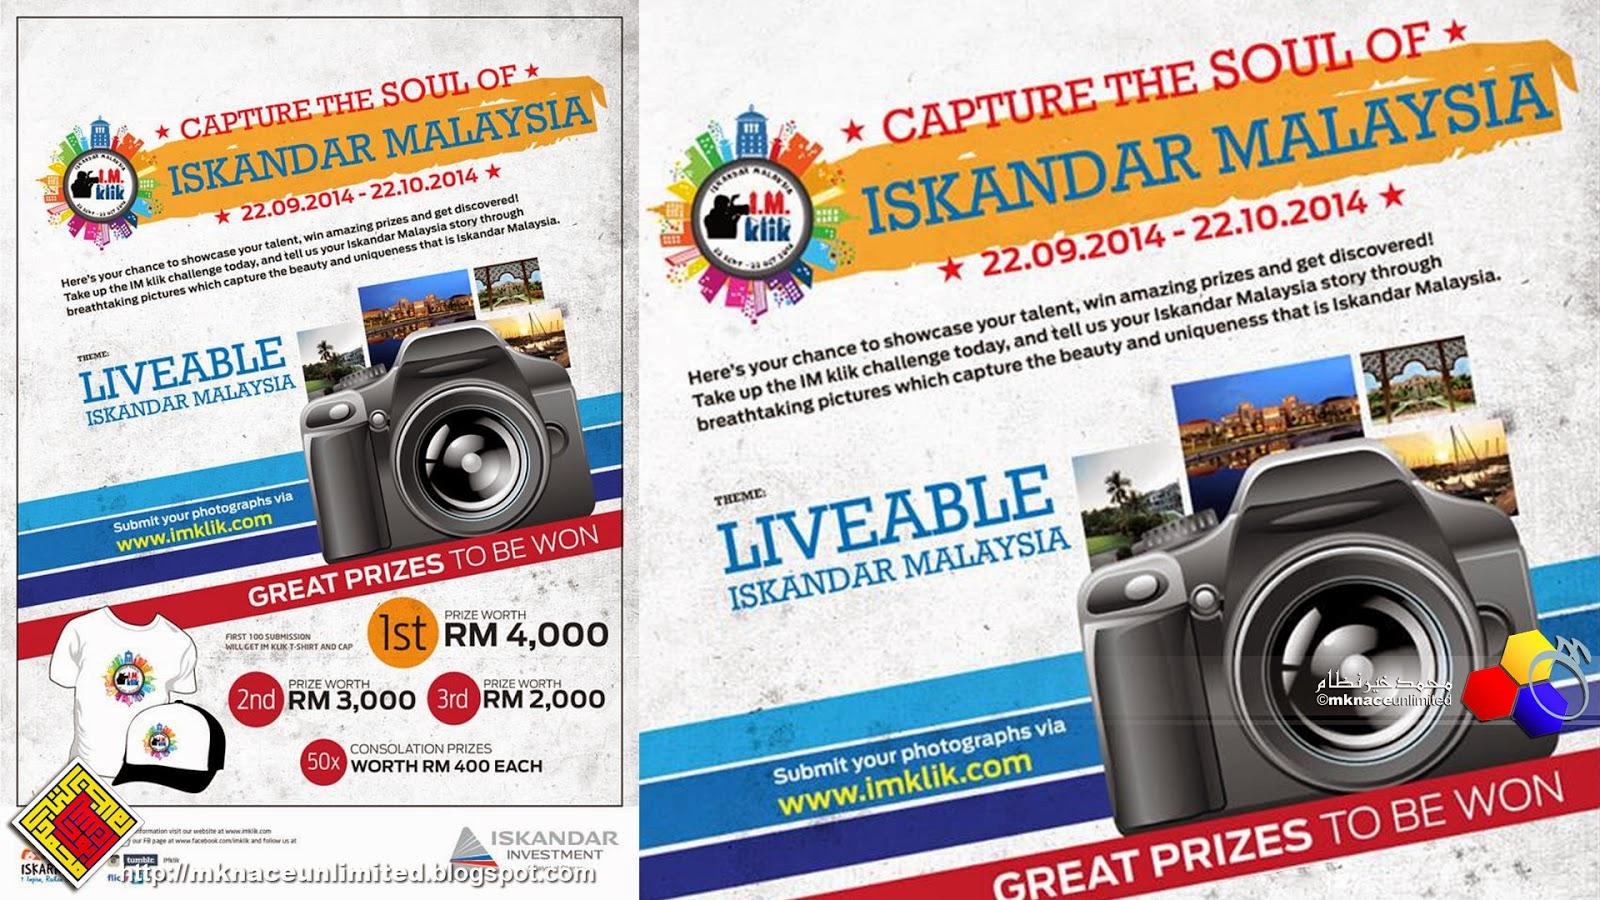 Im Klik 2014 Photography Competition Mknace Unlimited The Colours Gudang Garam Filter 12 Batang Gp Garpit International Of Life